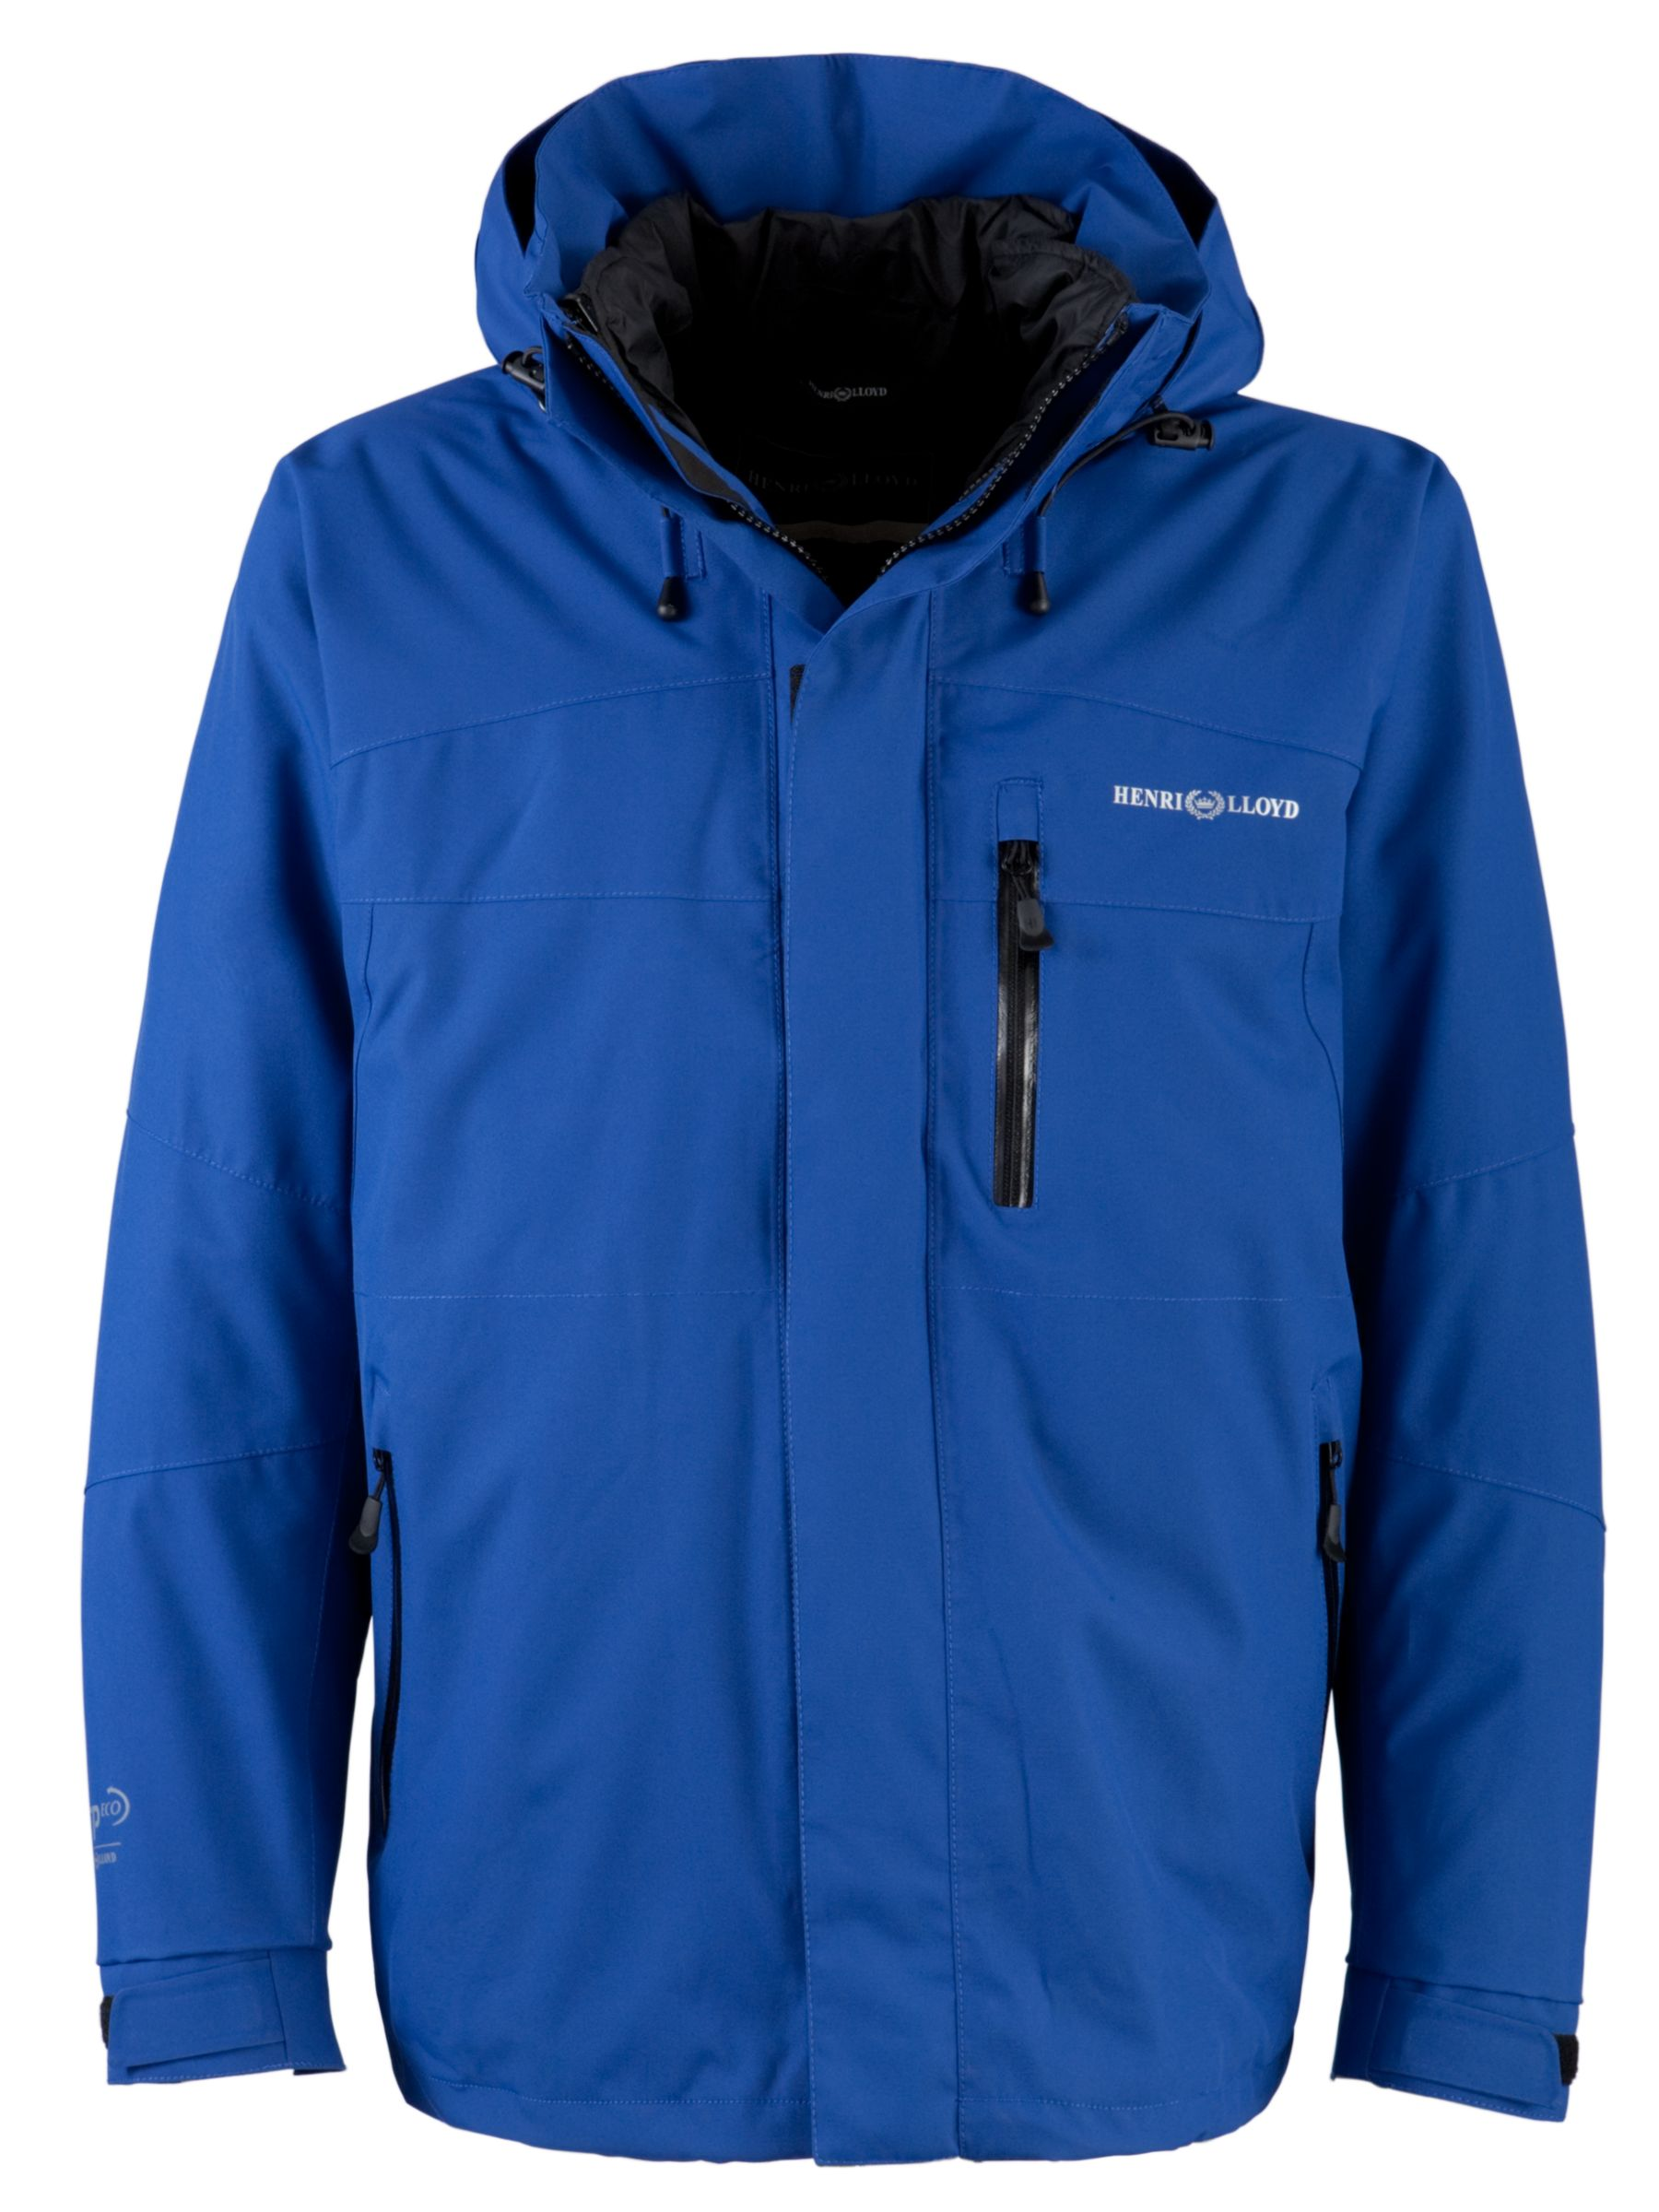 Henri Lloyd Brightstone Jacket, Pacific blue at John Lewis